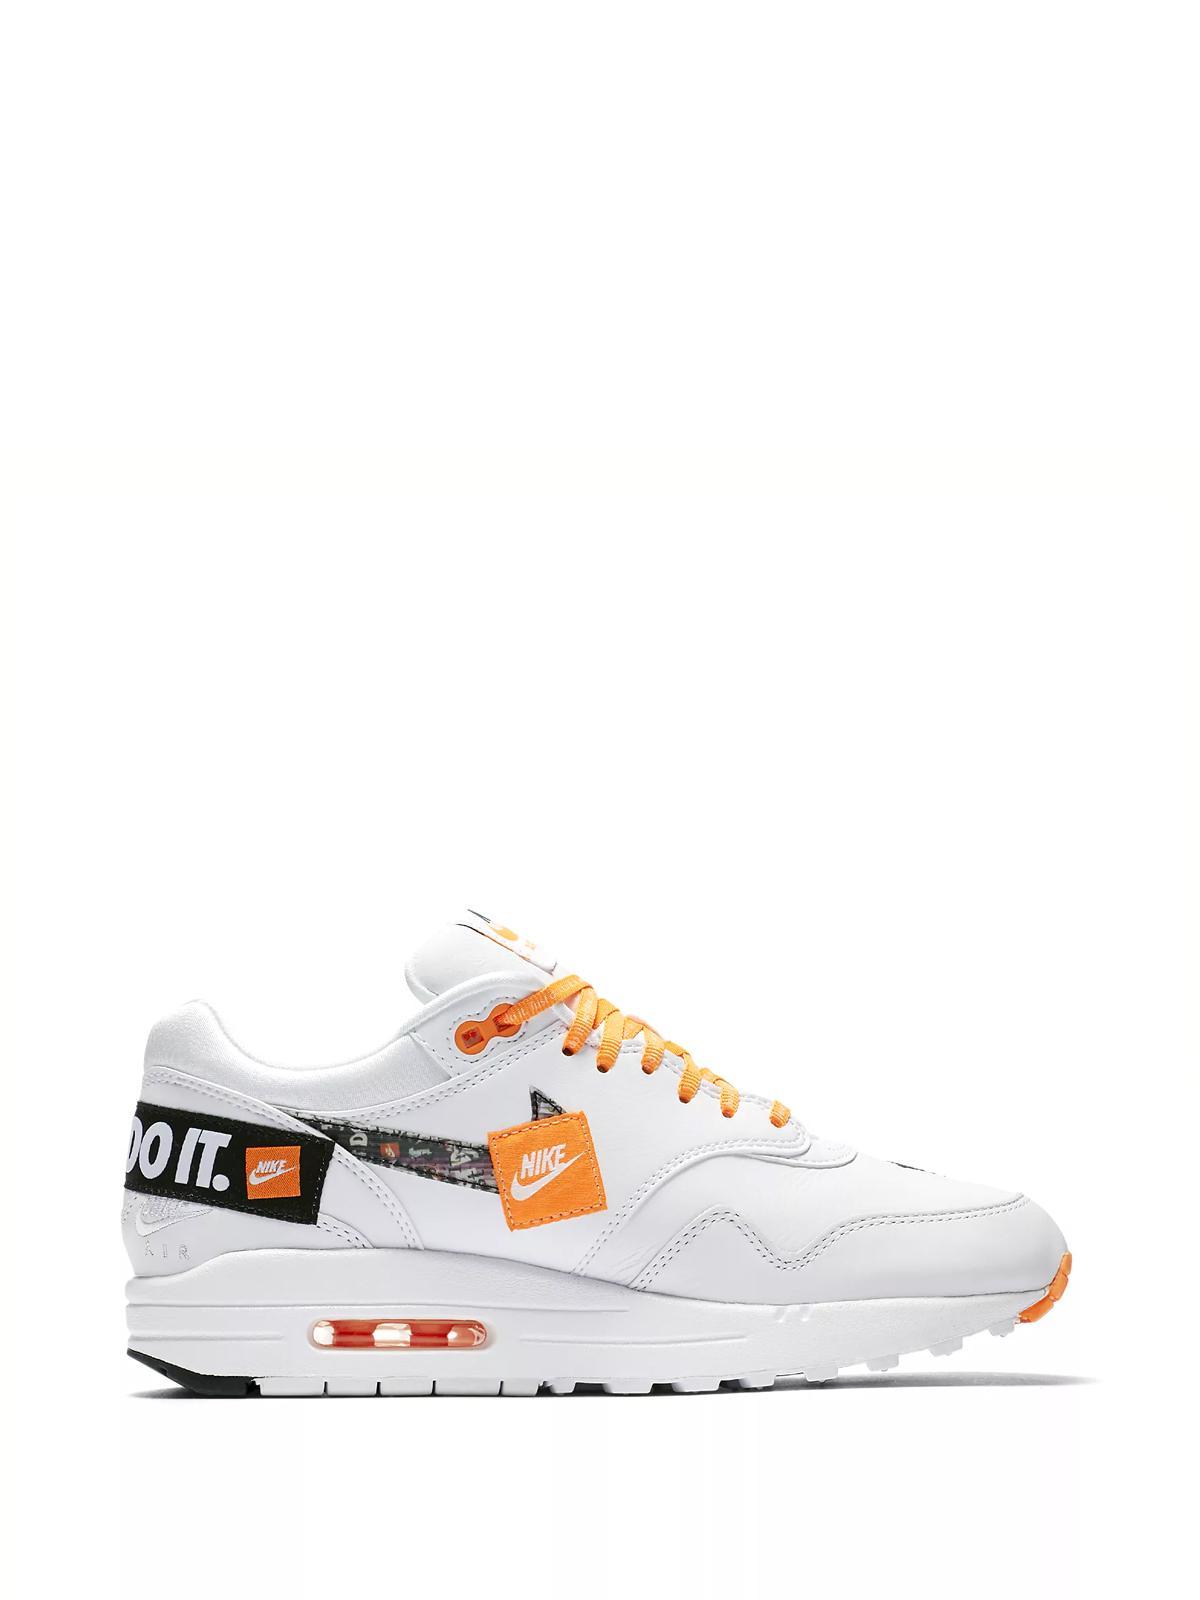 brand new bef0d 4c483 Lyst - Nike NIKE Sneaker air max 1 lx bianca